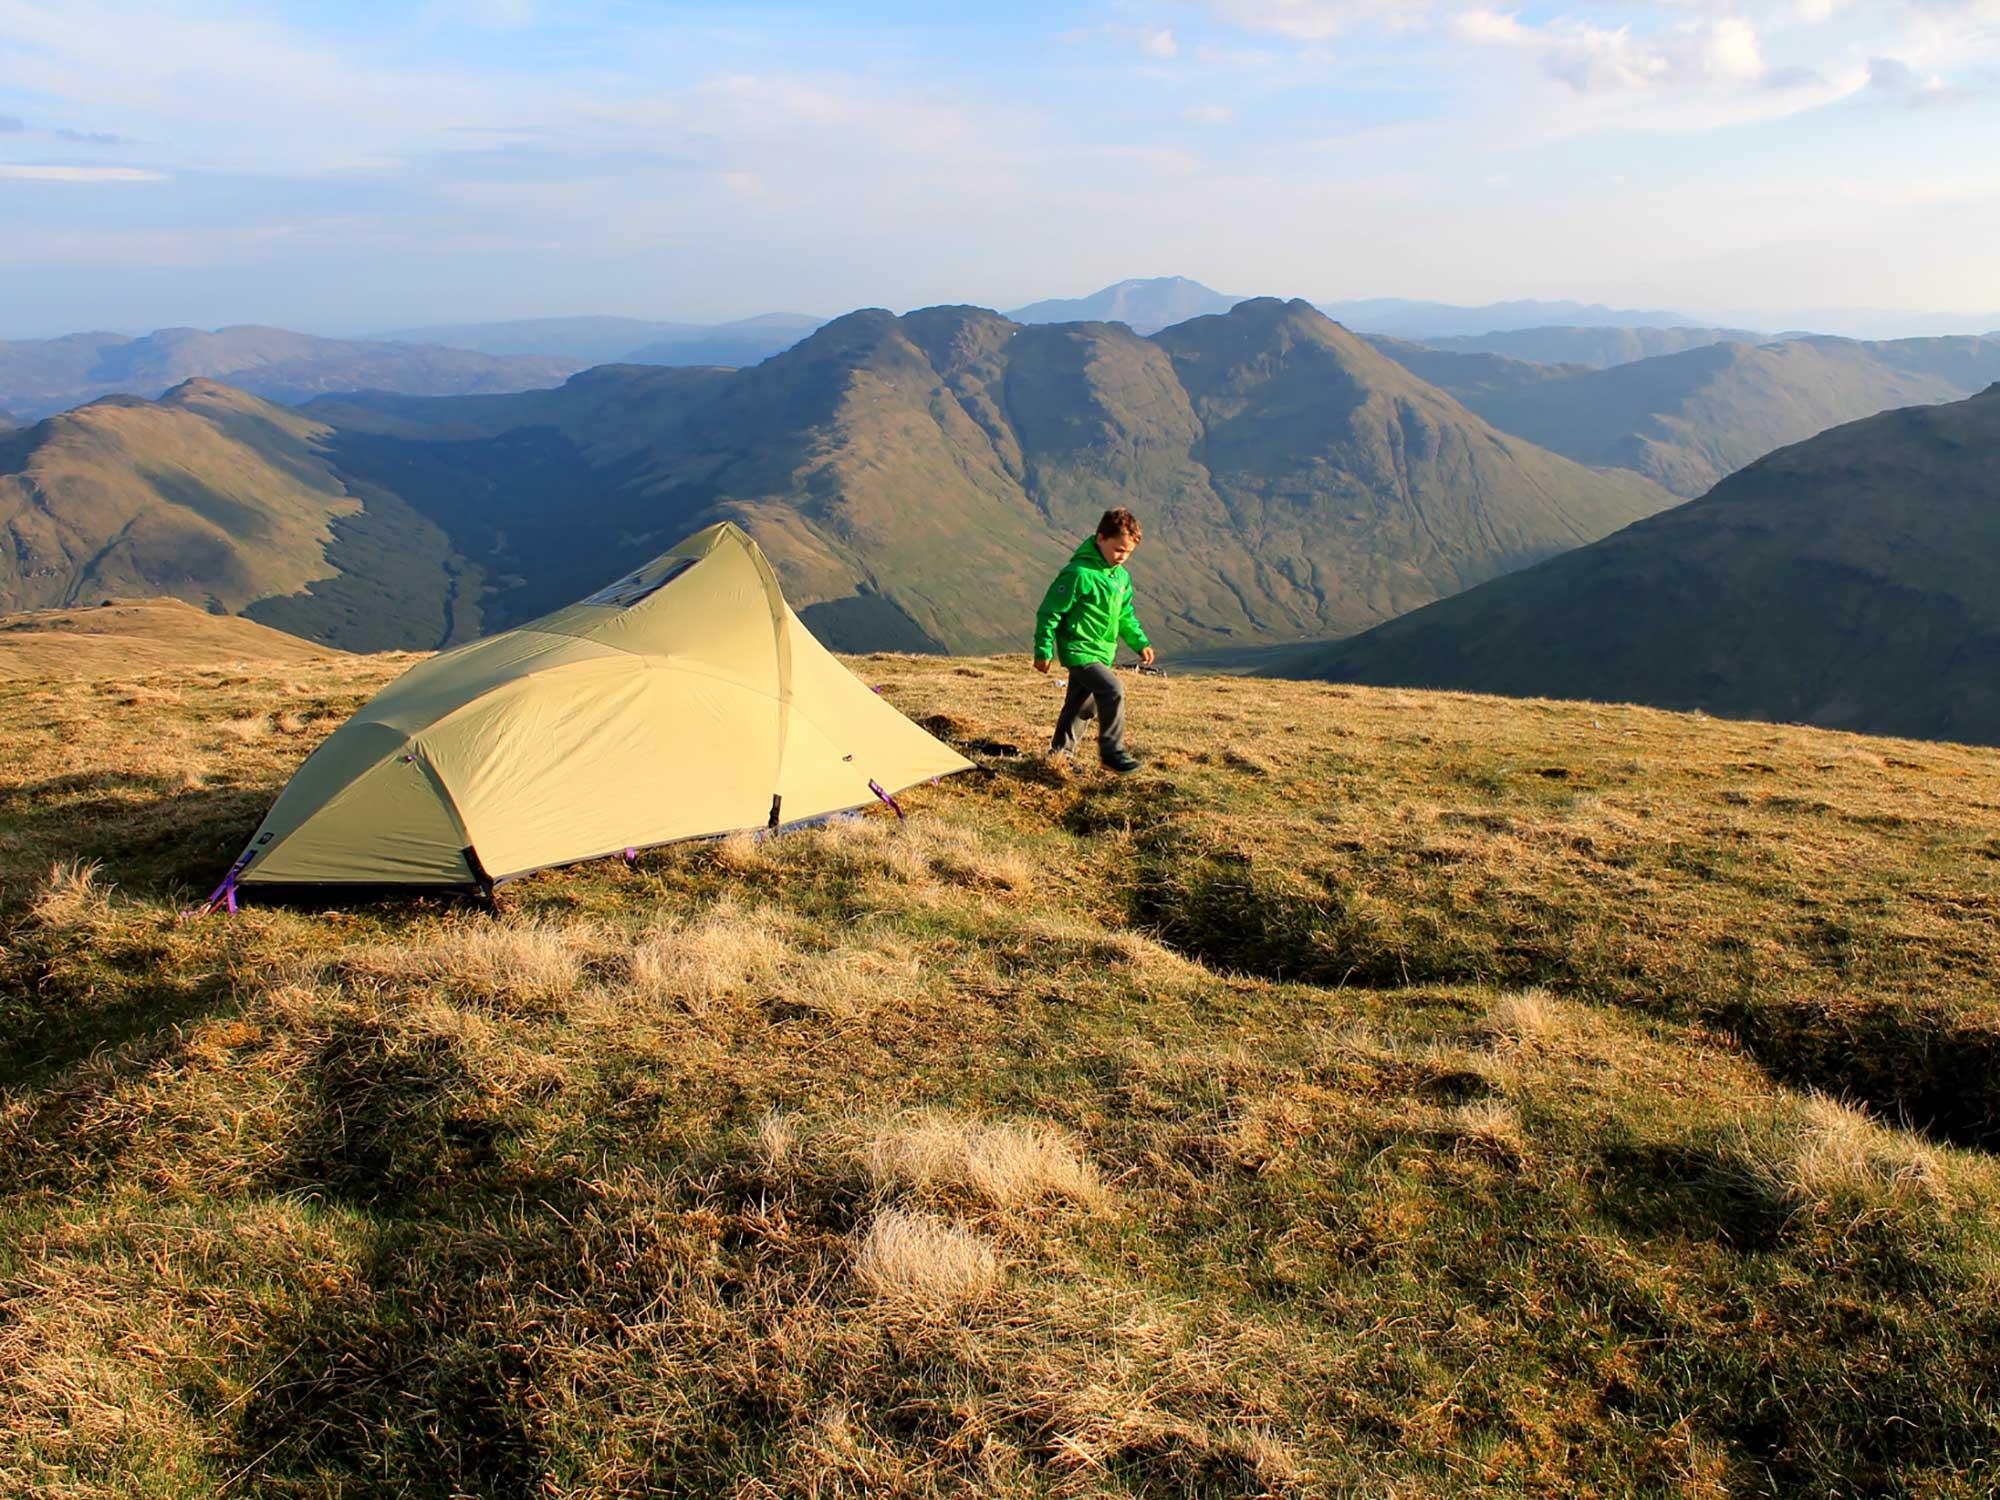 Ridge camping